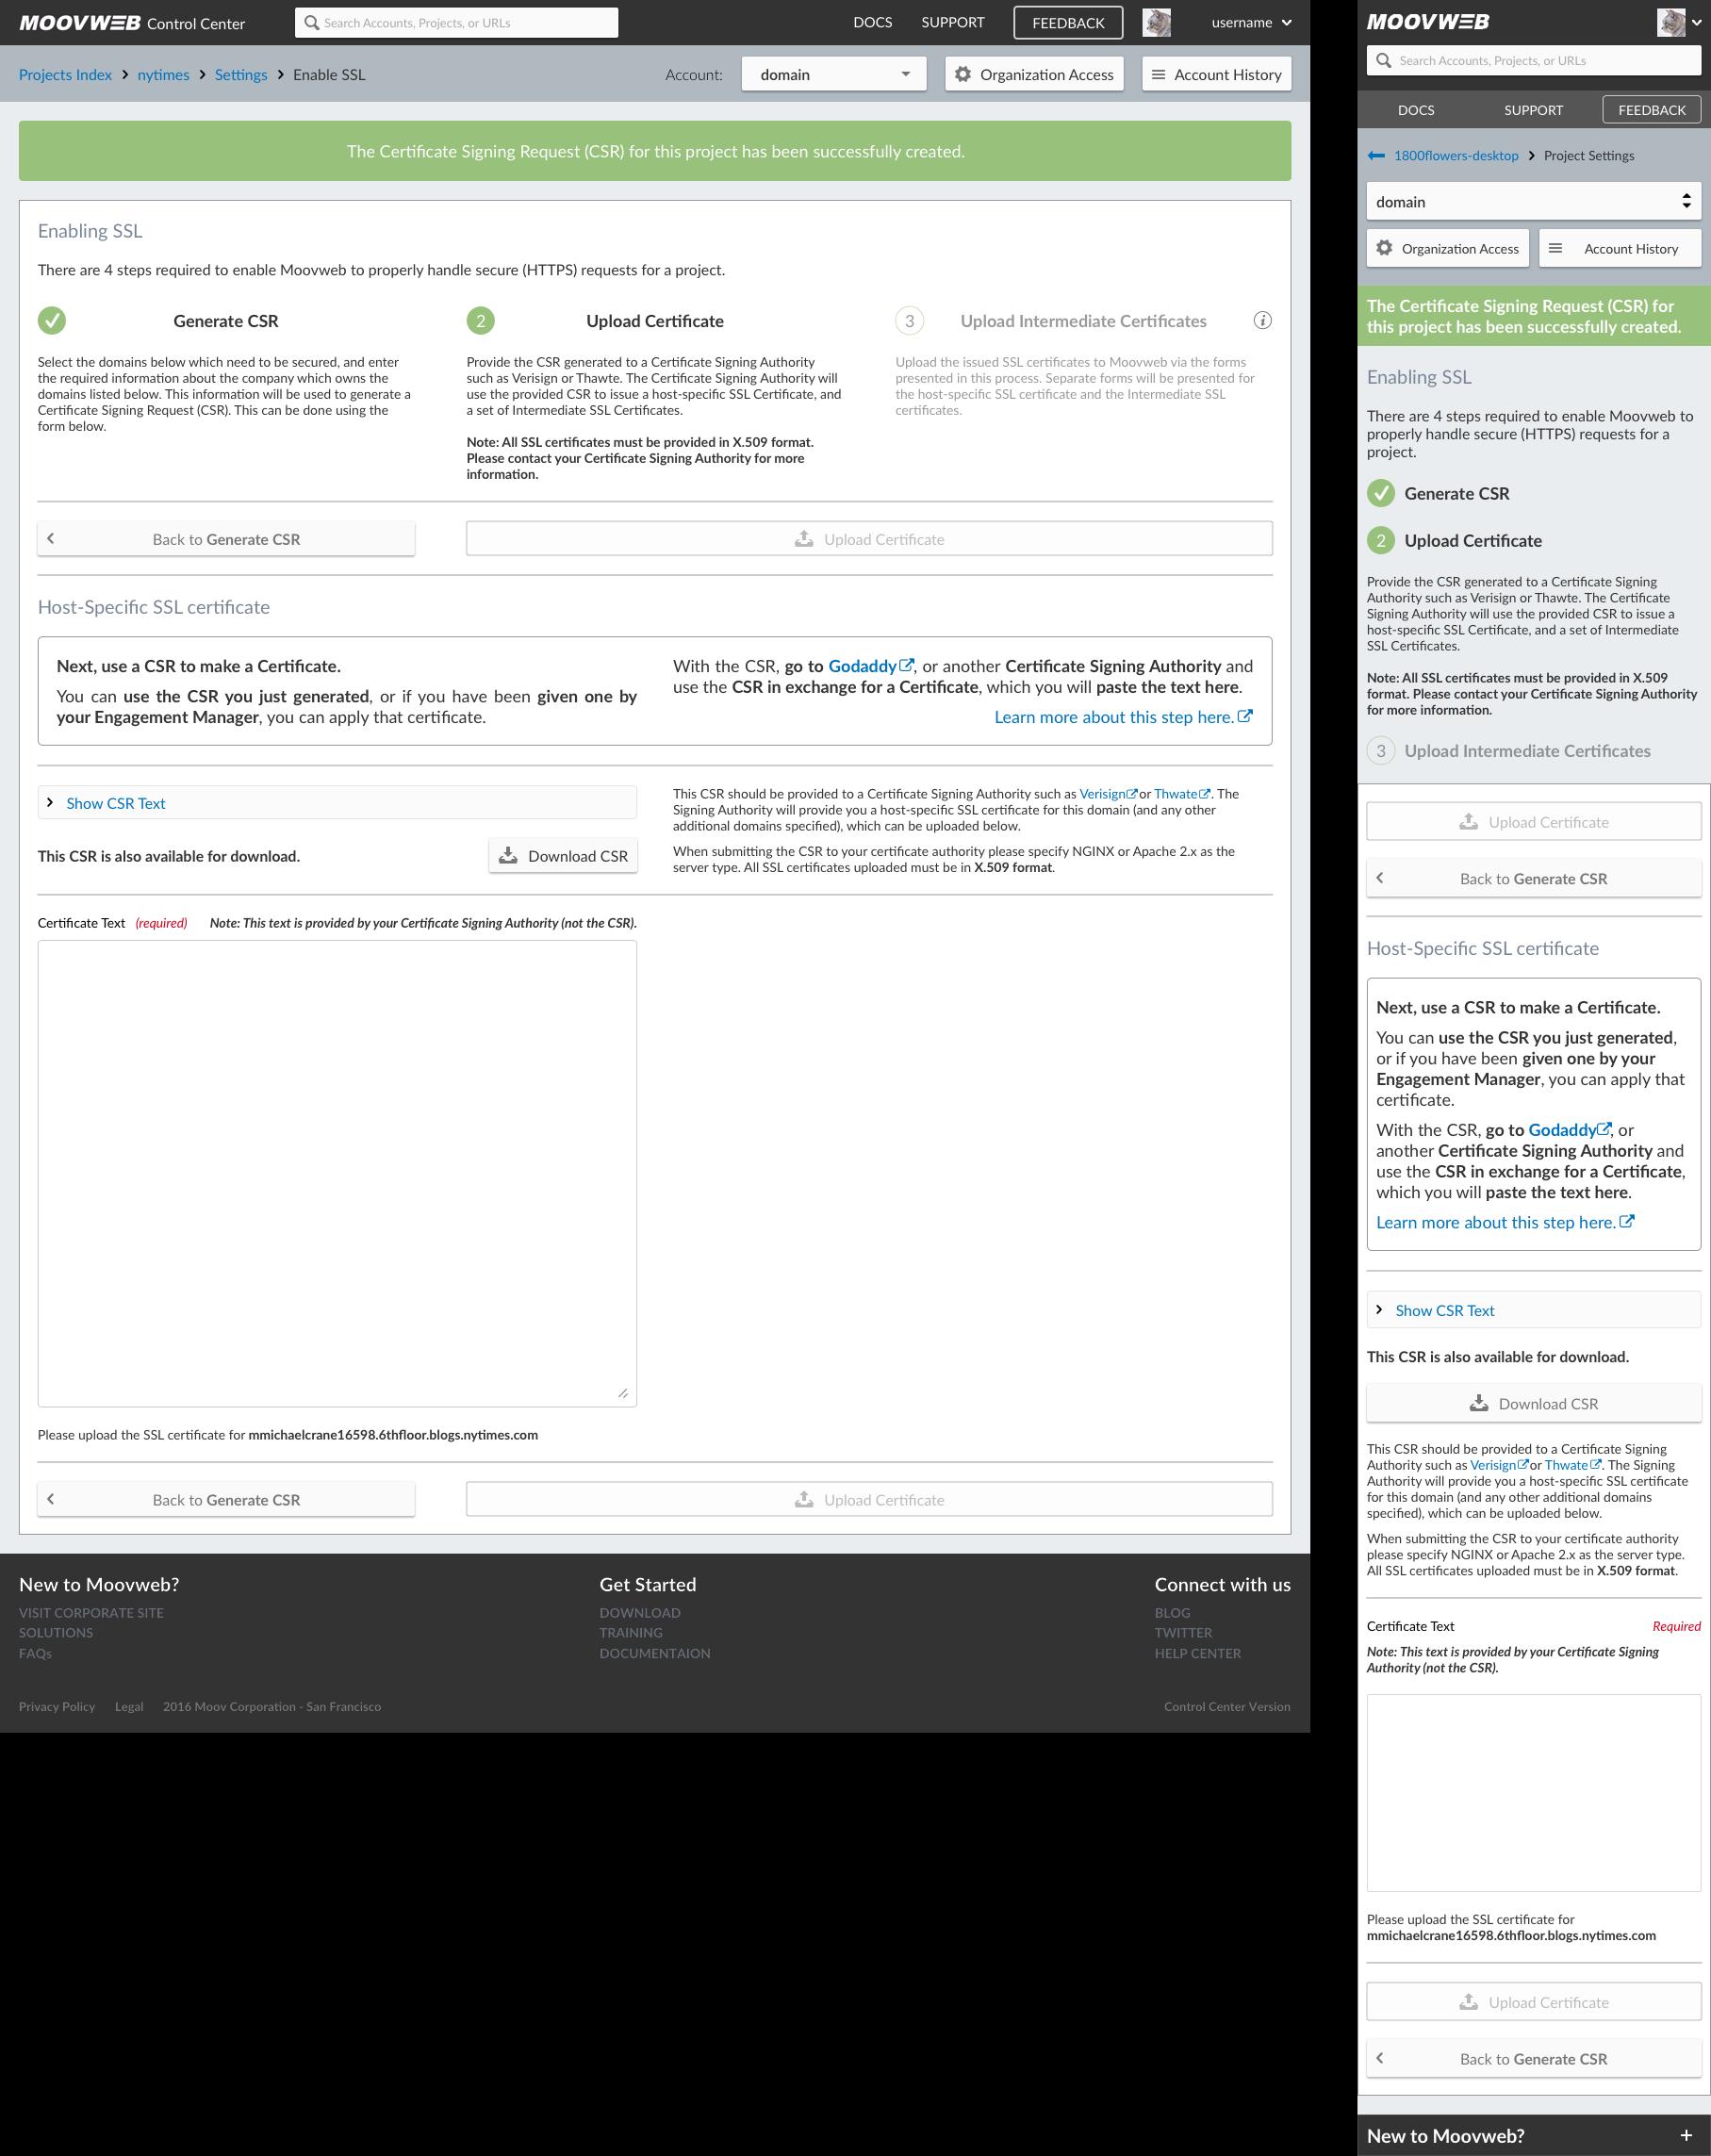 Upload Certificate - Hide Text